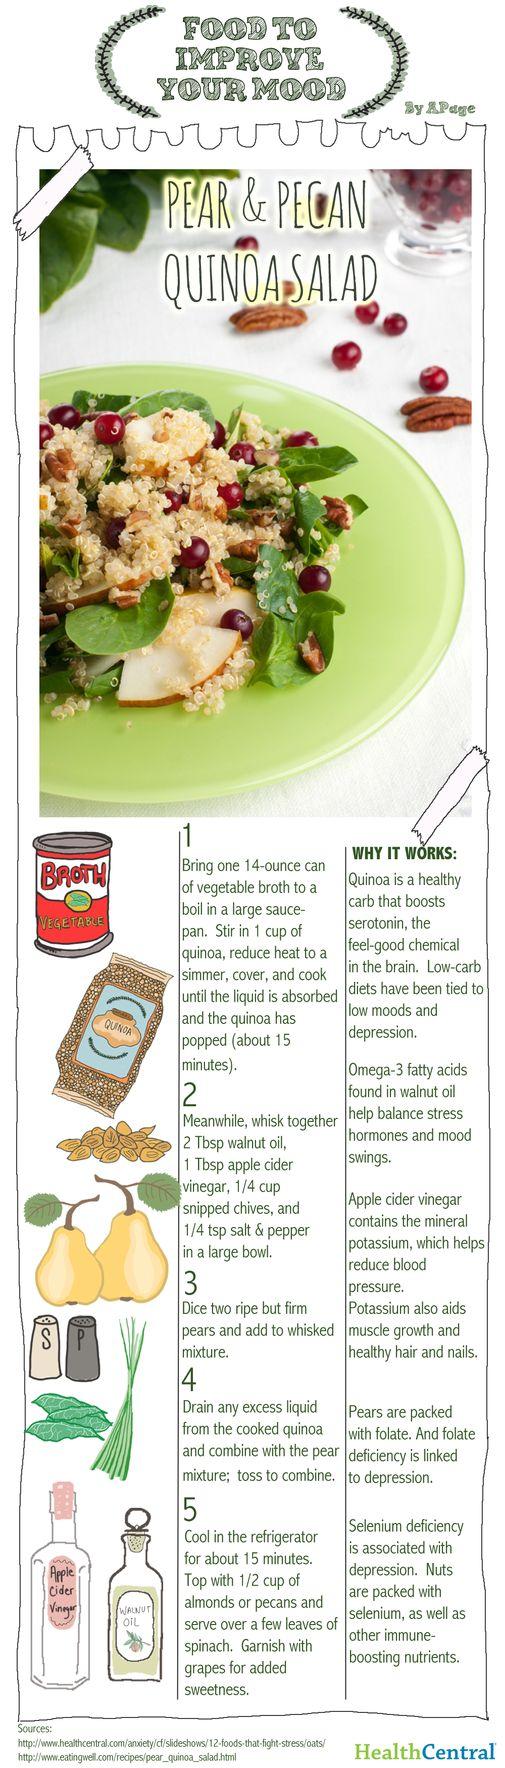 (RECIPE INFOGRAPHIC) Food To Improve Your Mood: Pear & Pecan Quinoa Salad - Prevention - Depression